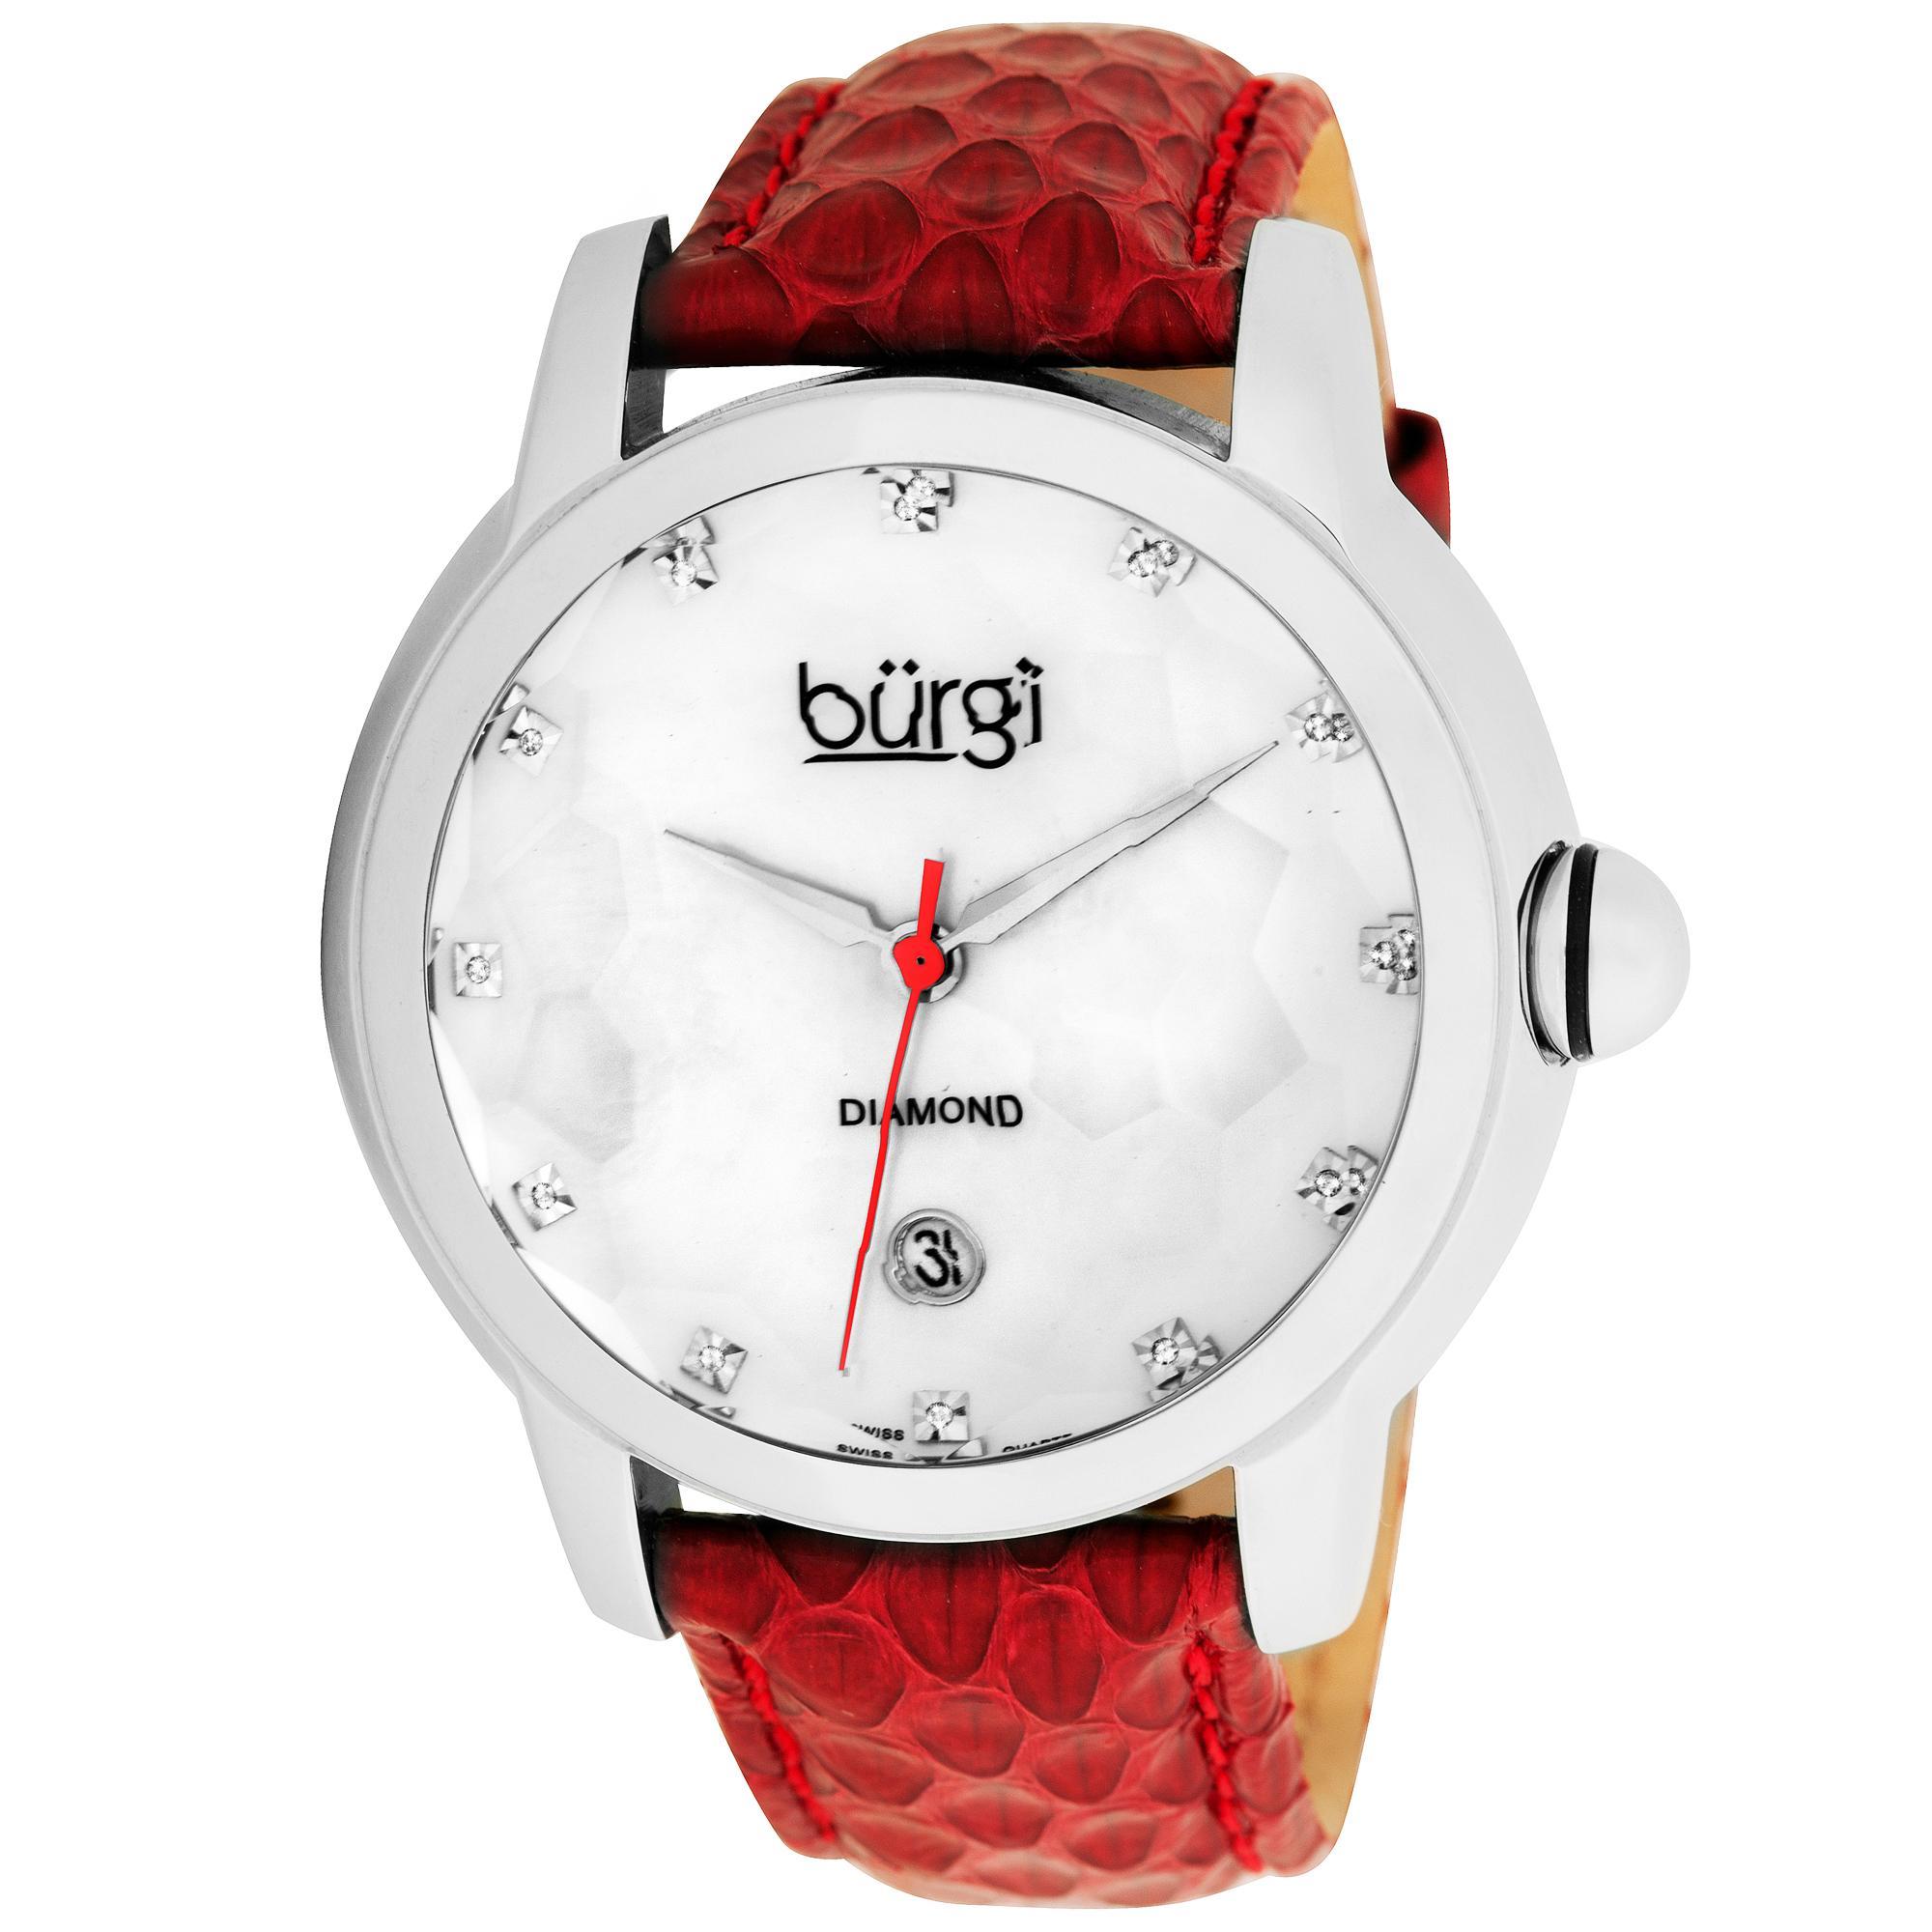 Burgi Women's Diamond Swiss Quartz Date Red Strap Watch